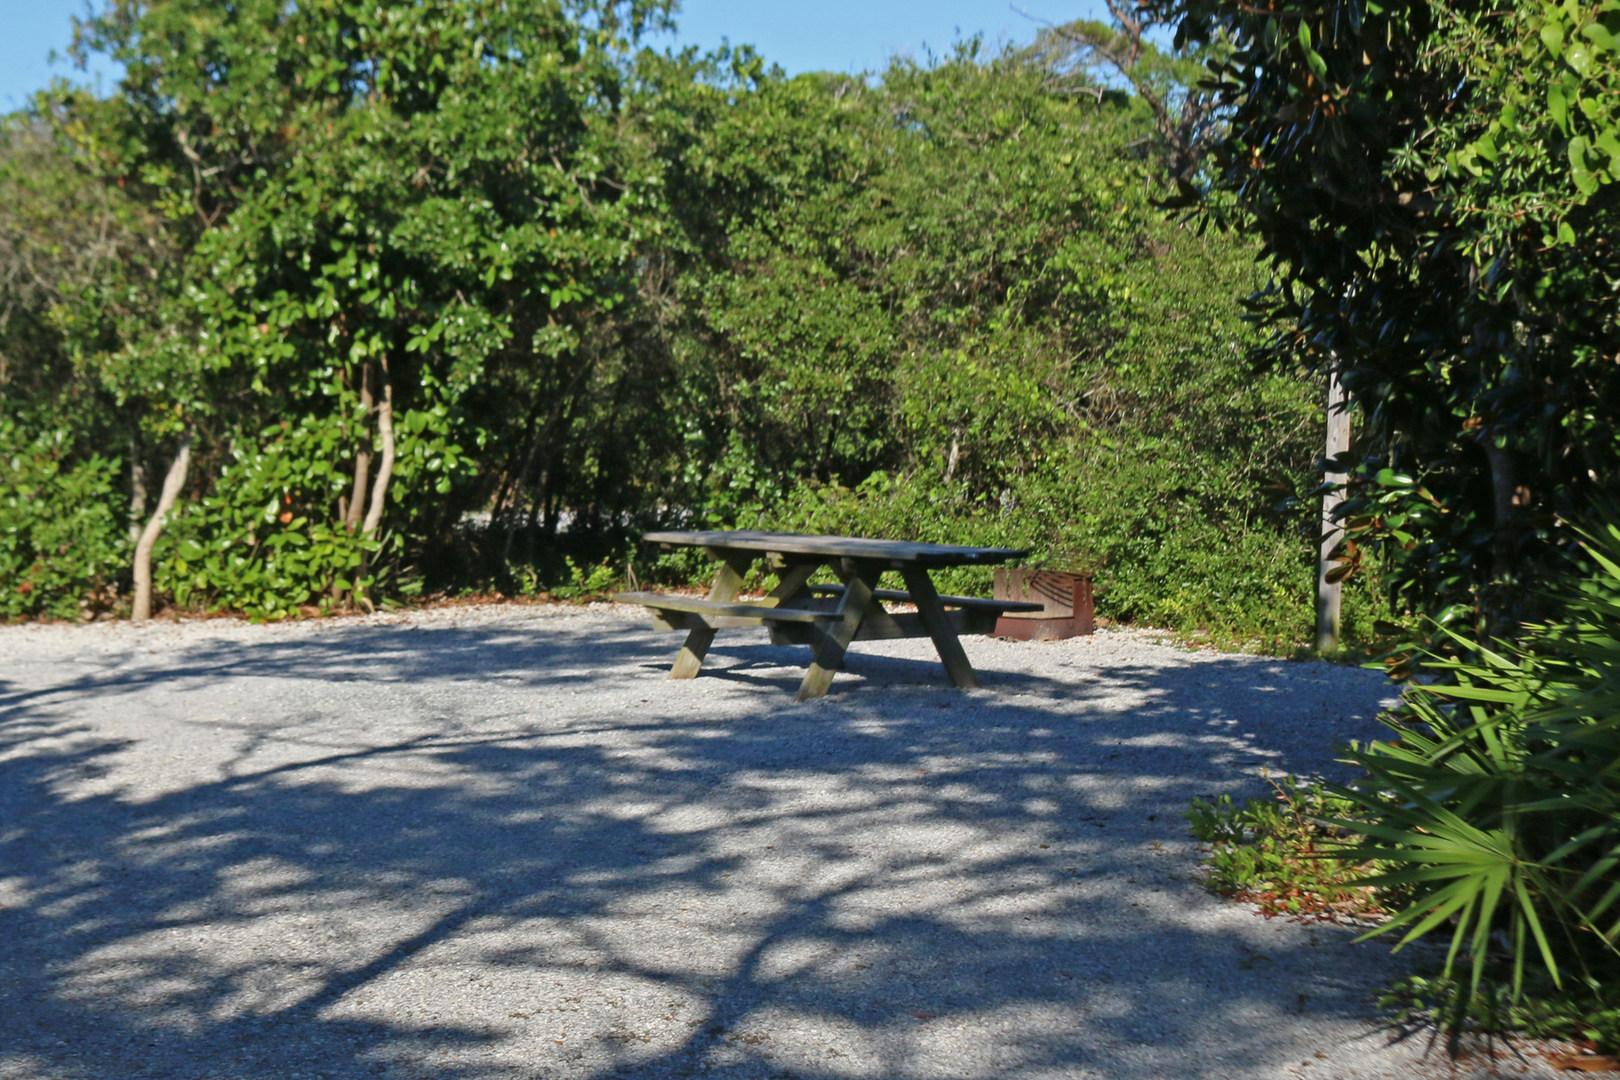 10 of Floridas Great RV Parks  VISIT FLORIDA